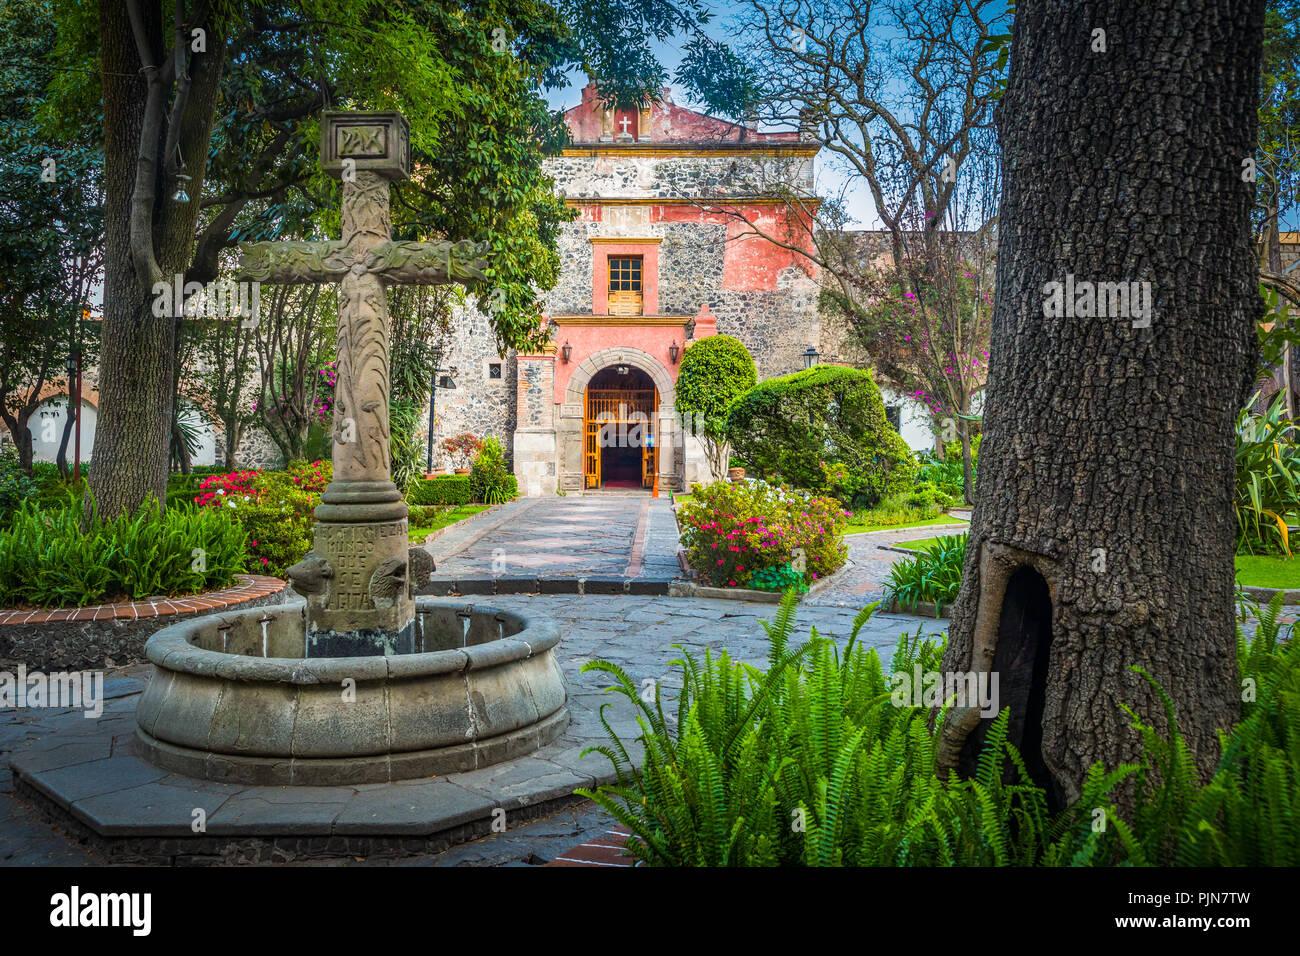 Parroquia San Jacinto in San Angel quartiere di Città del Messico. San Ángel è una colonia o quartiere di Città del Messico. Immagini Stock